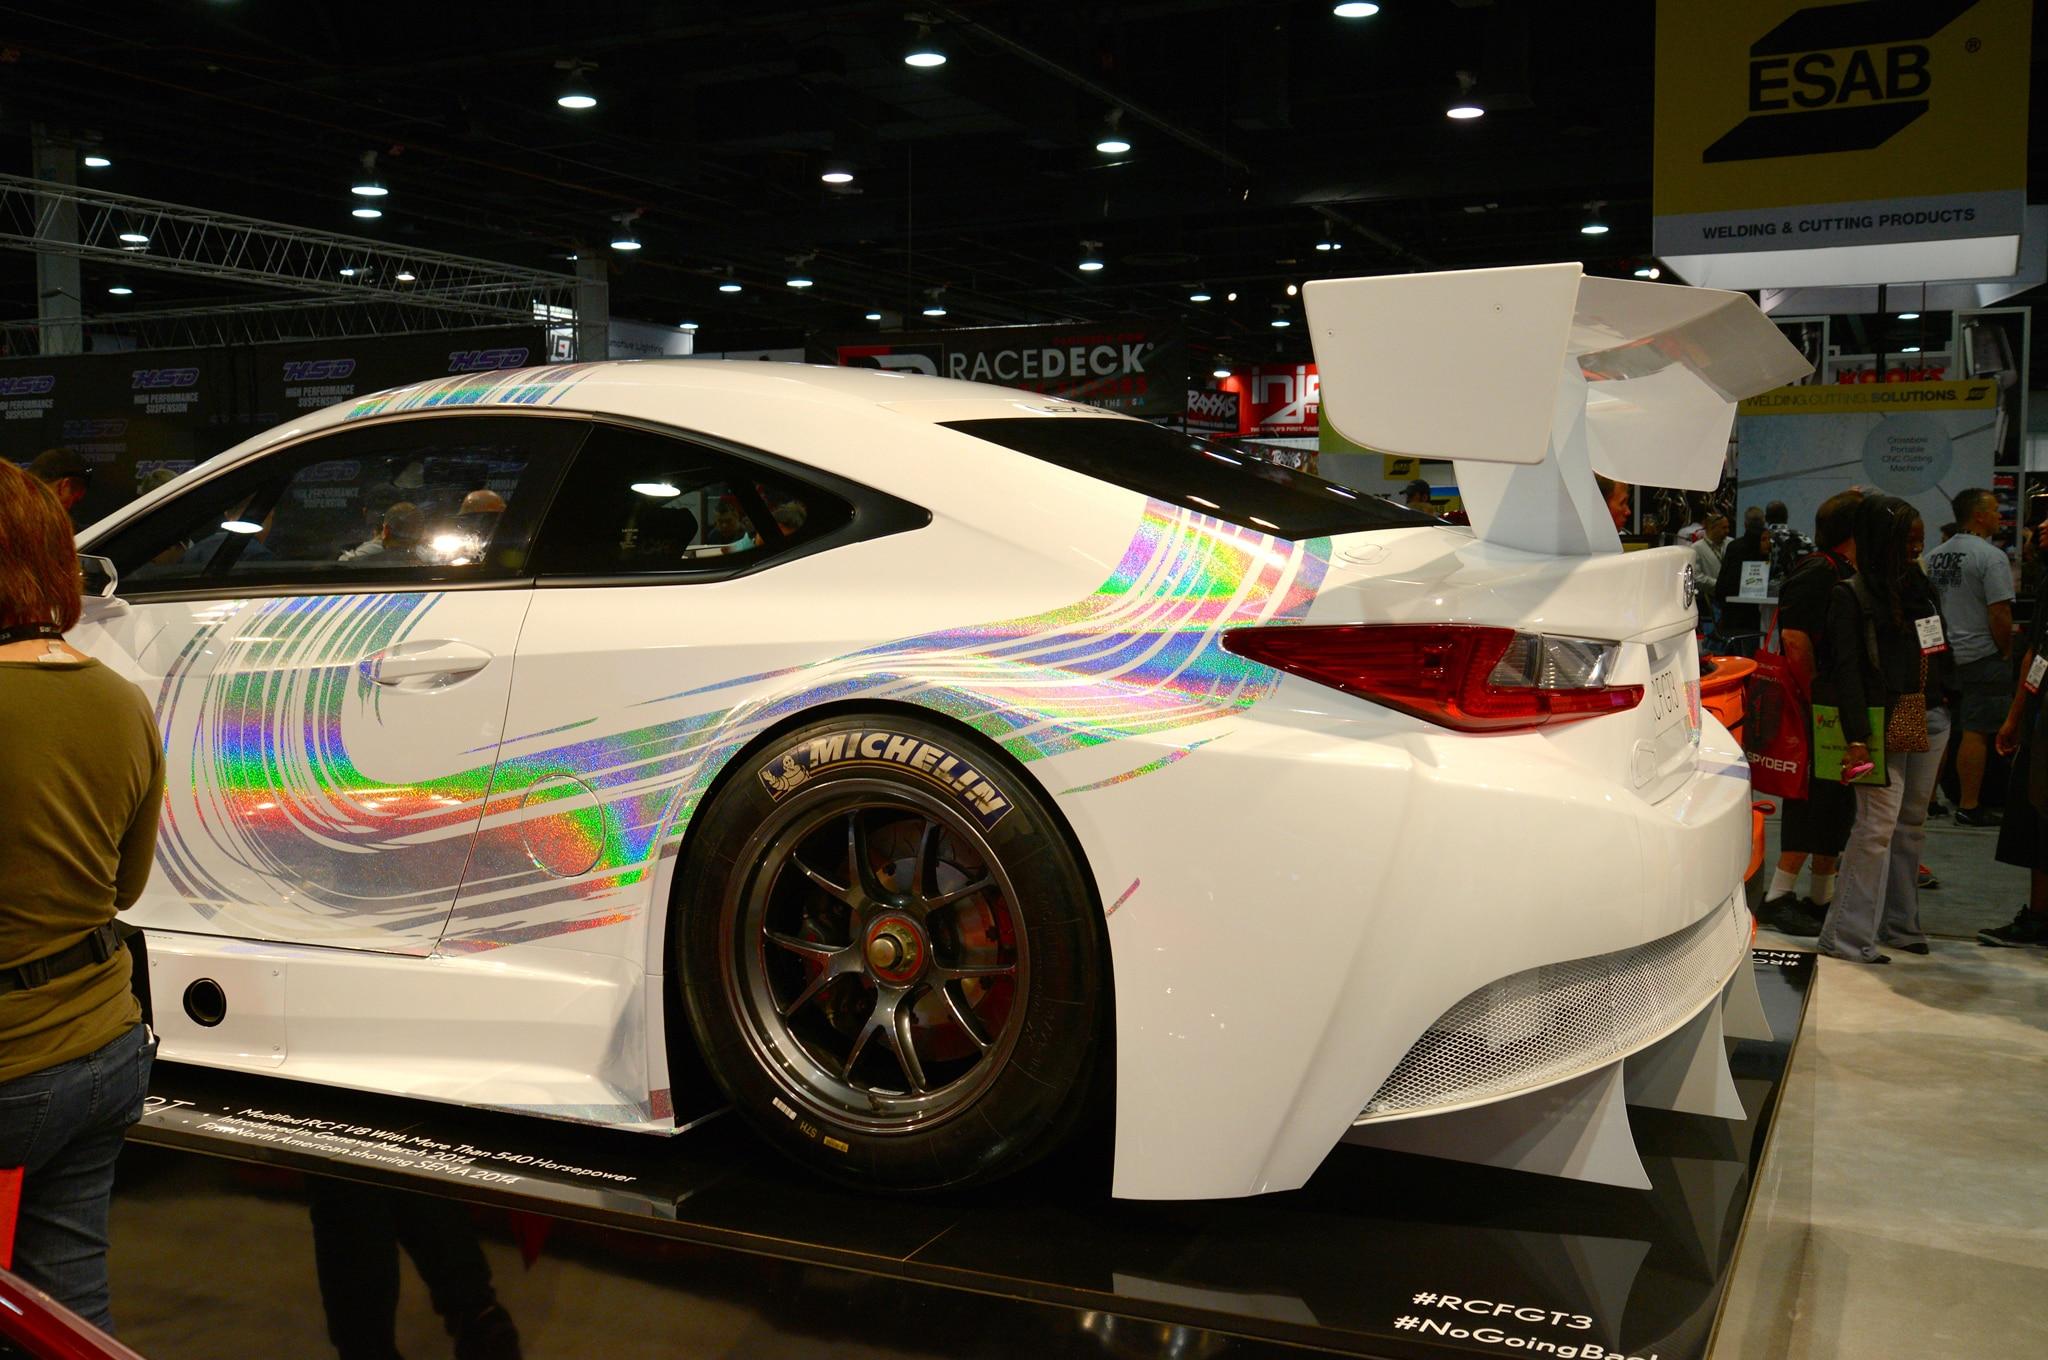 https://st.automobilemag.com/uploads/sites/11/2015/01/Lexus-RC-F-GT3-Concept-rear-three-quarter.jpg